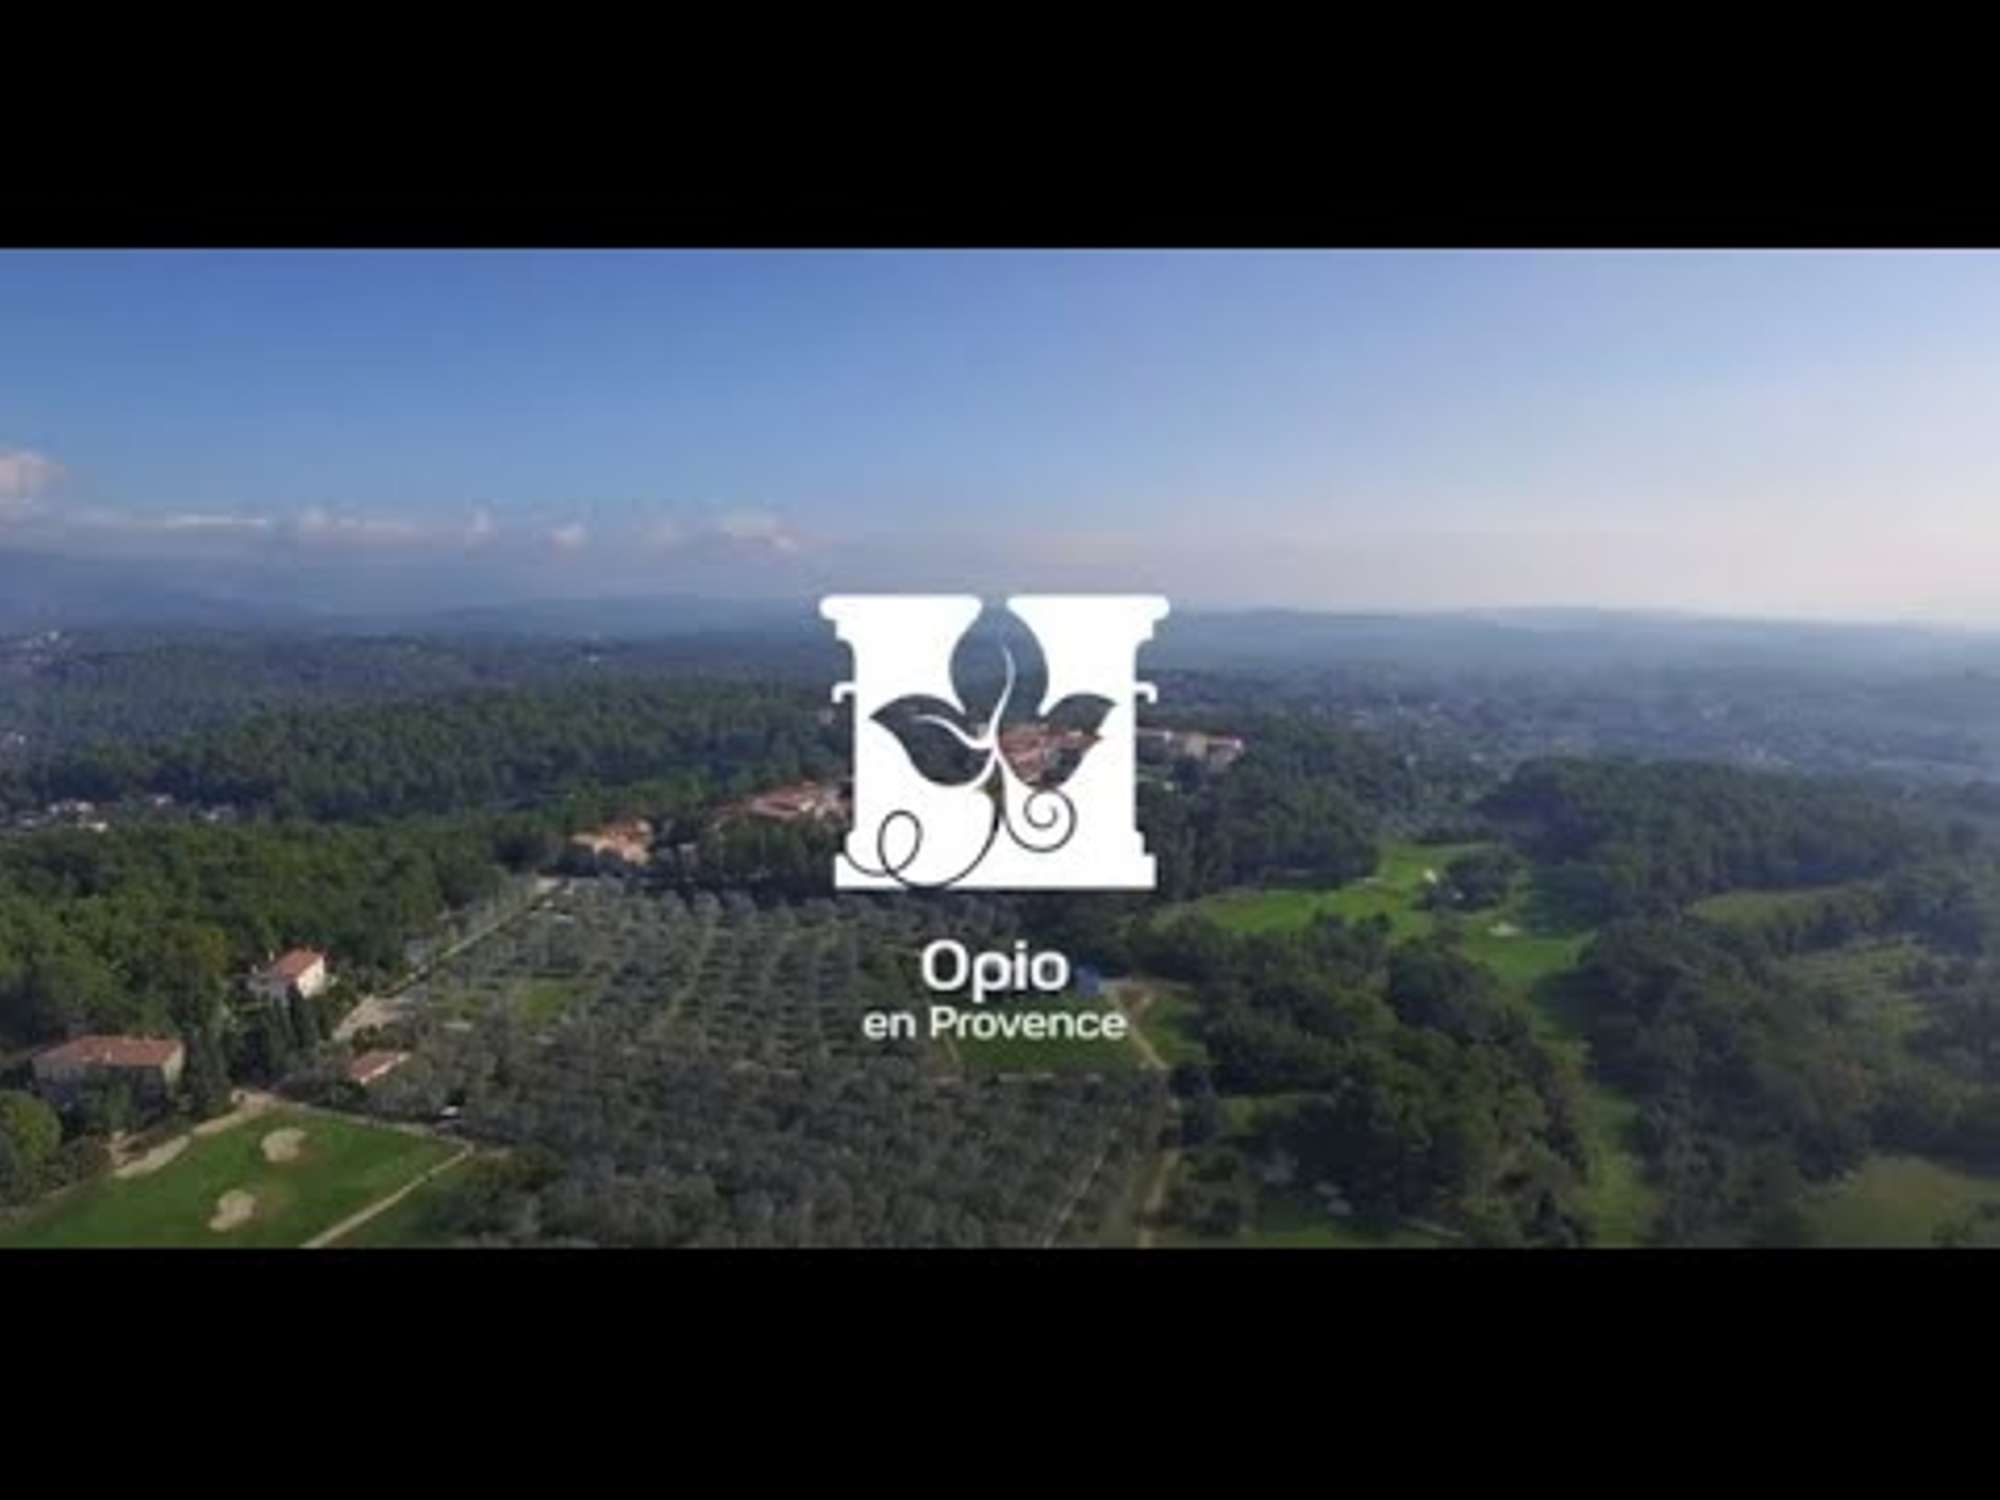 Abrir Opio en Provence videos slideshow em 1